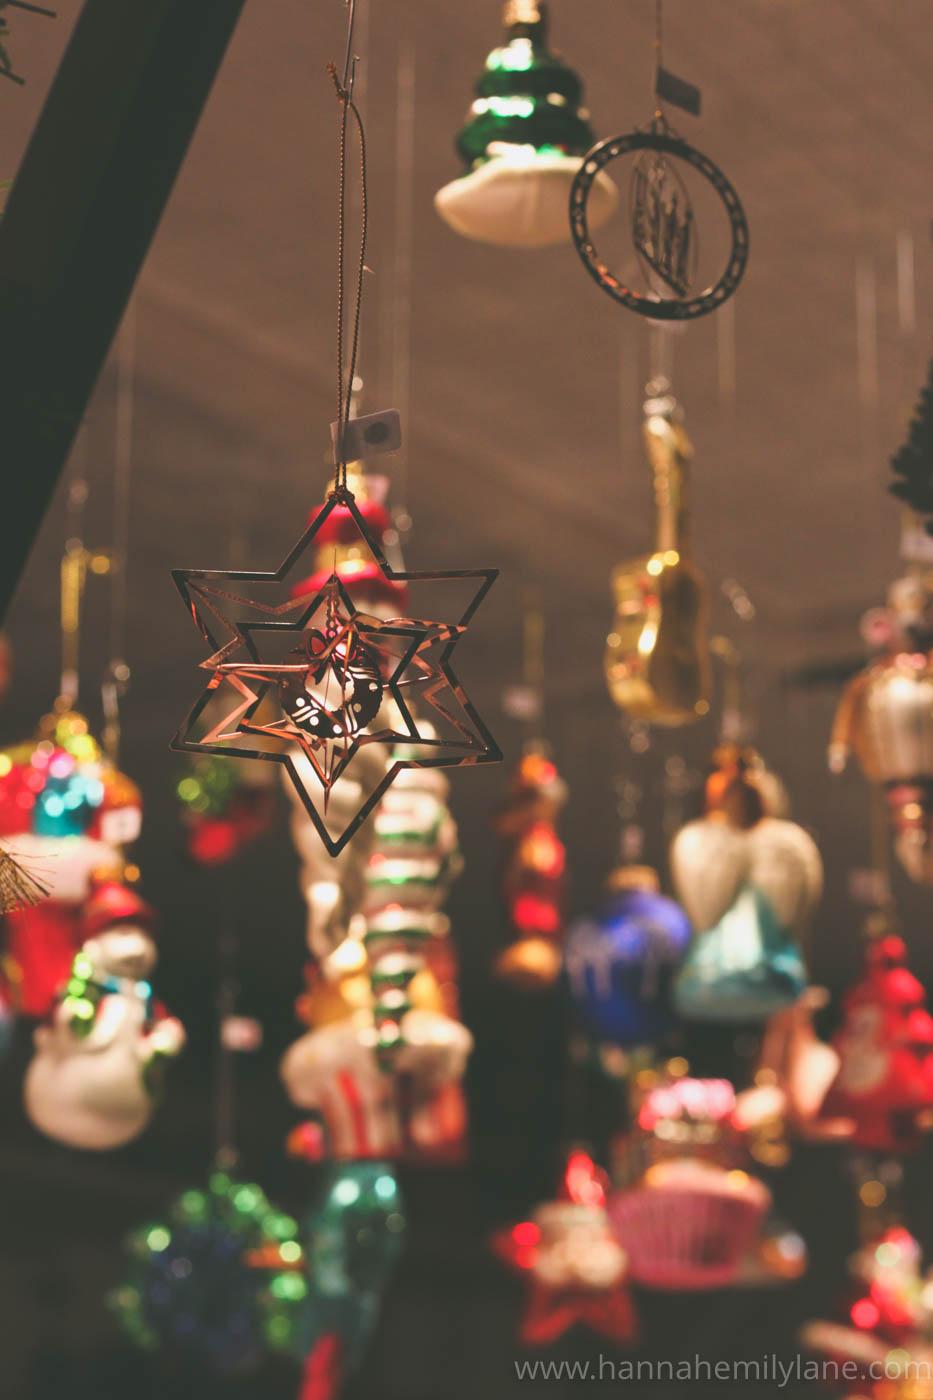 Birmingham Christmas Markets | www.hannahemilylane.com-9.jpg